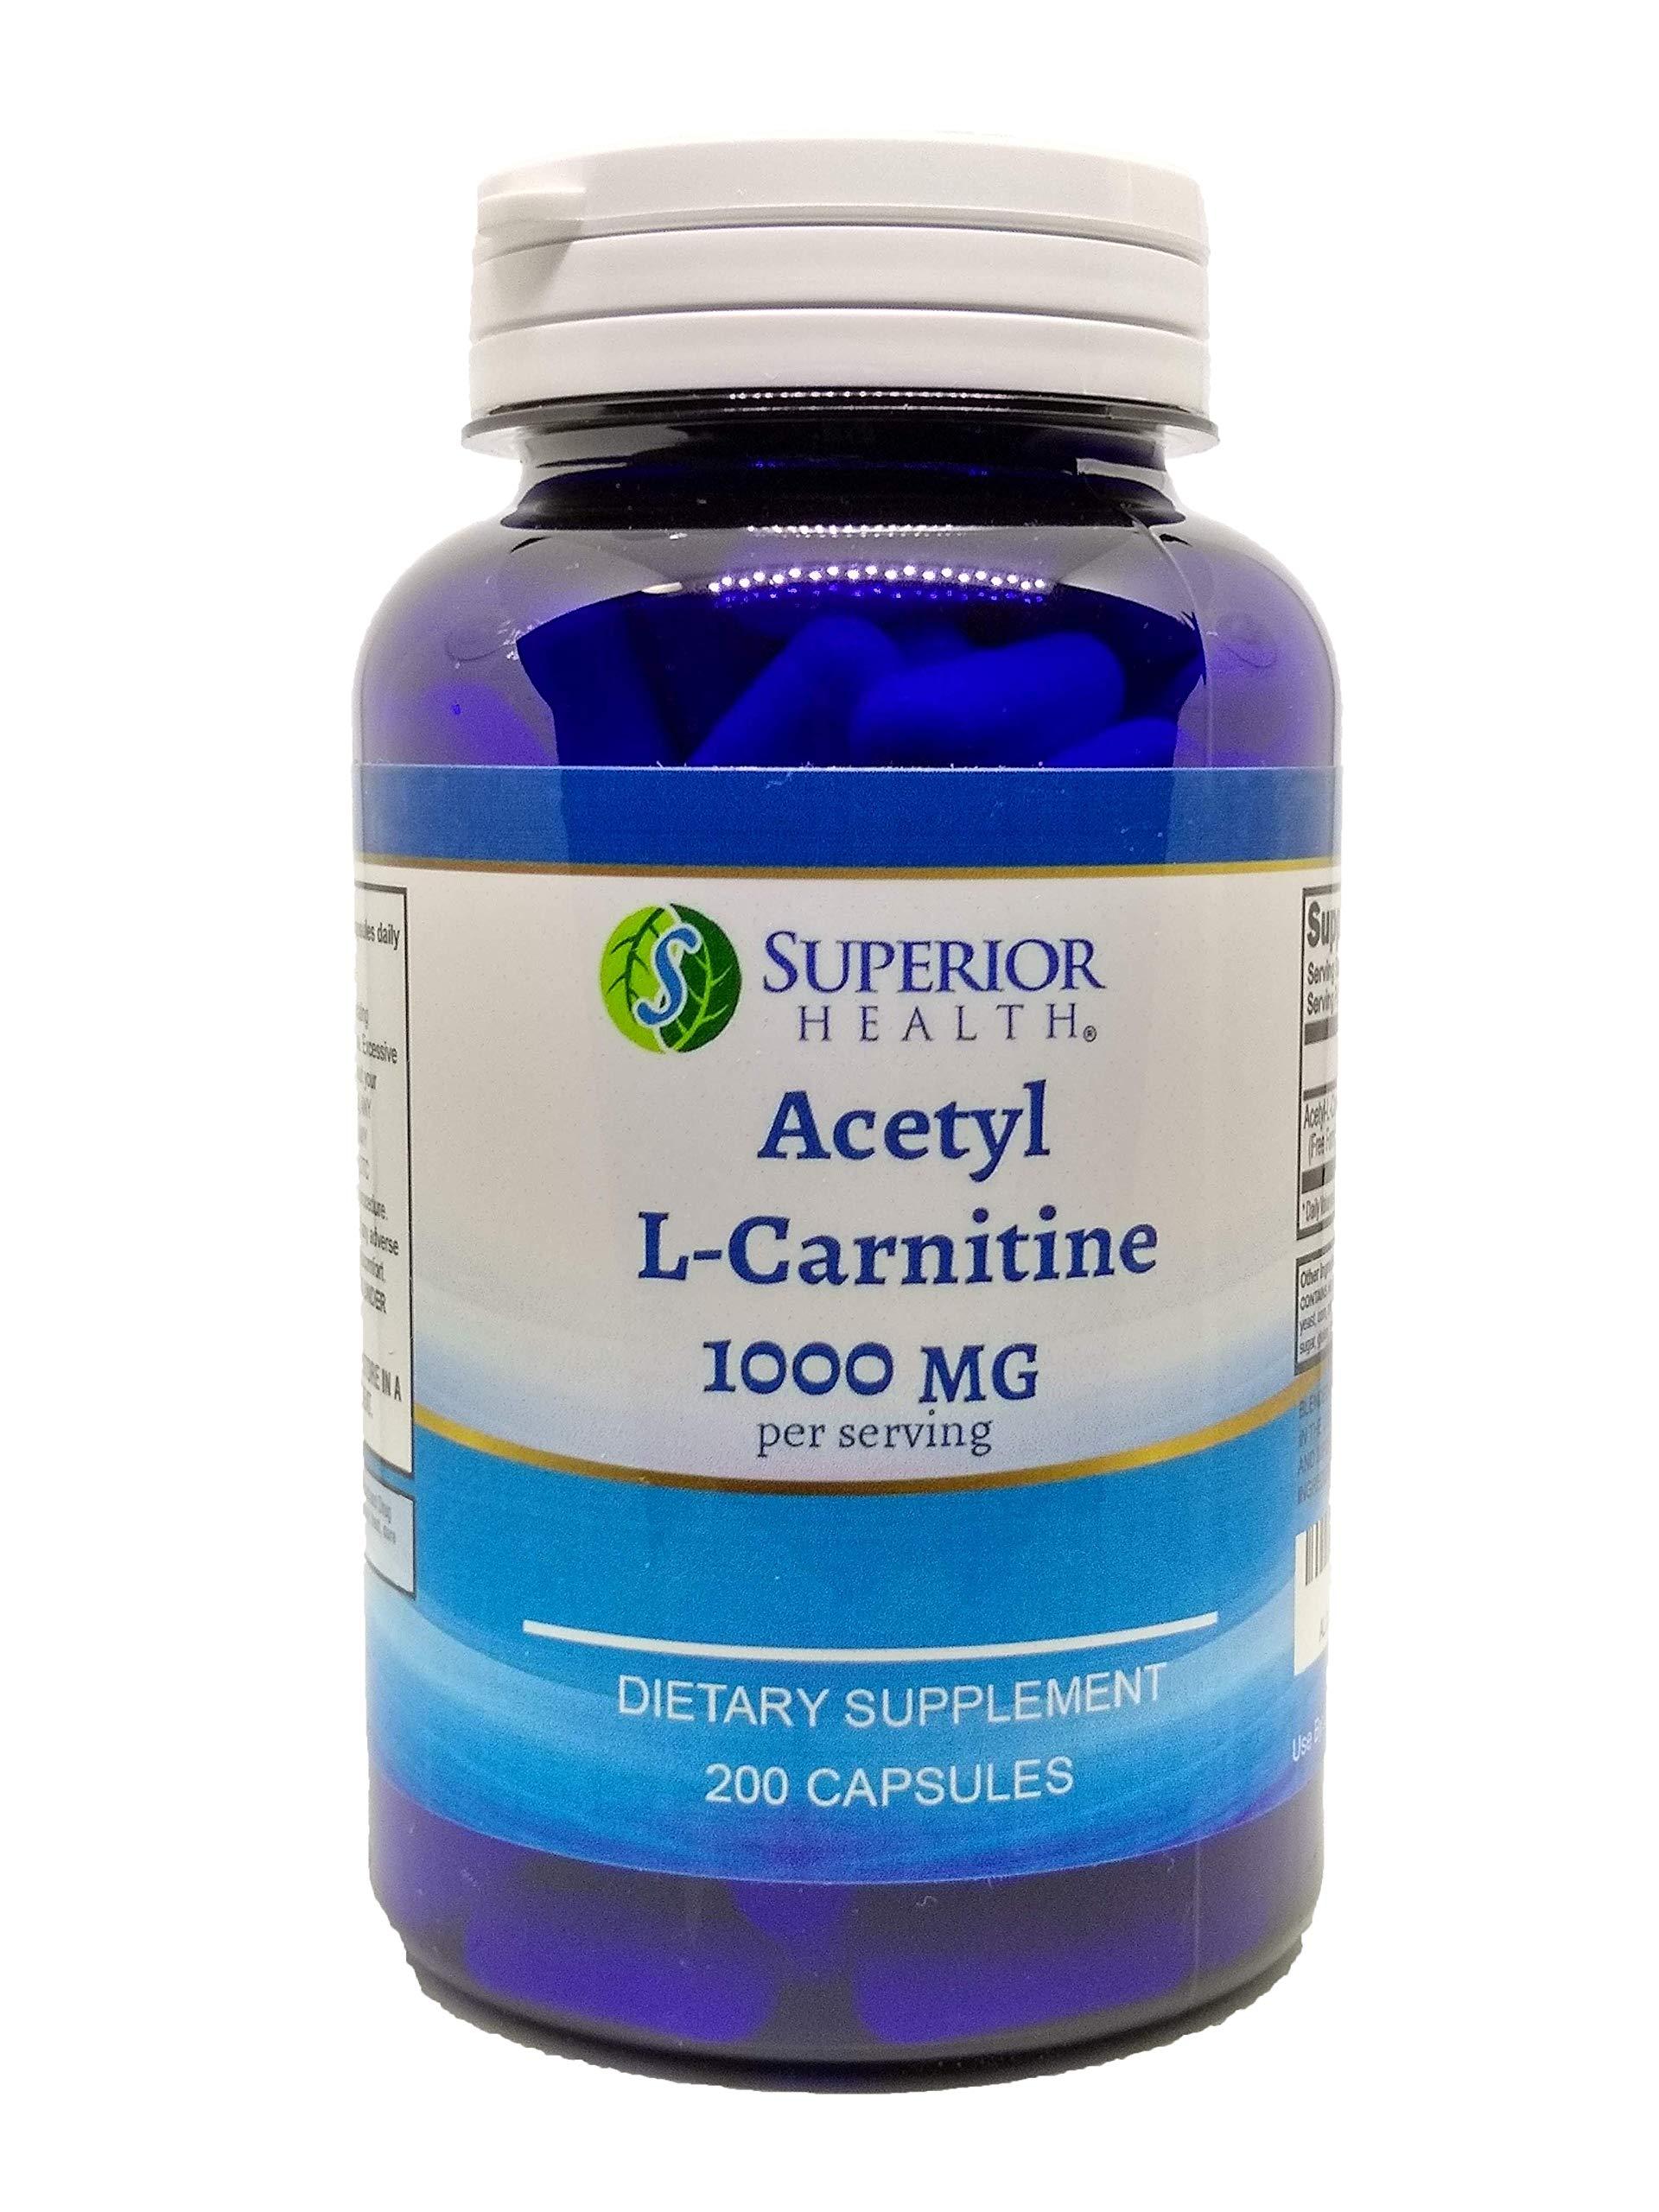 Acetyl L-Carnitine Supplement 1000mg per Serving 200 Capsules (ALCAR)